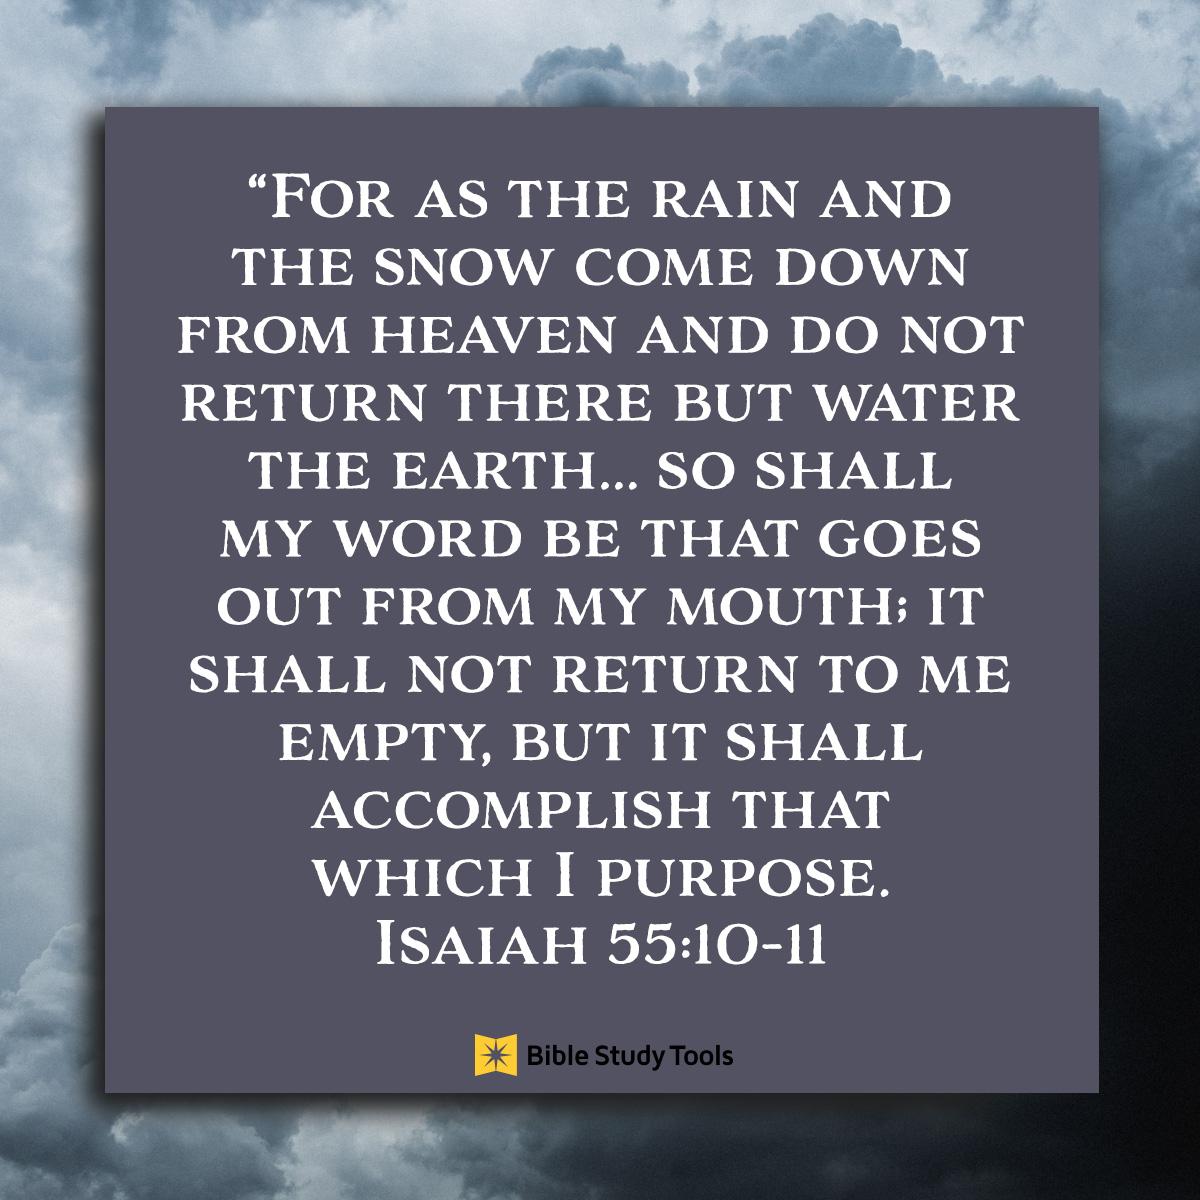 Isaiah 55:10-11, inspirational image